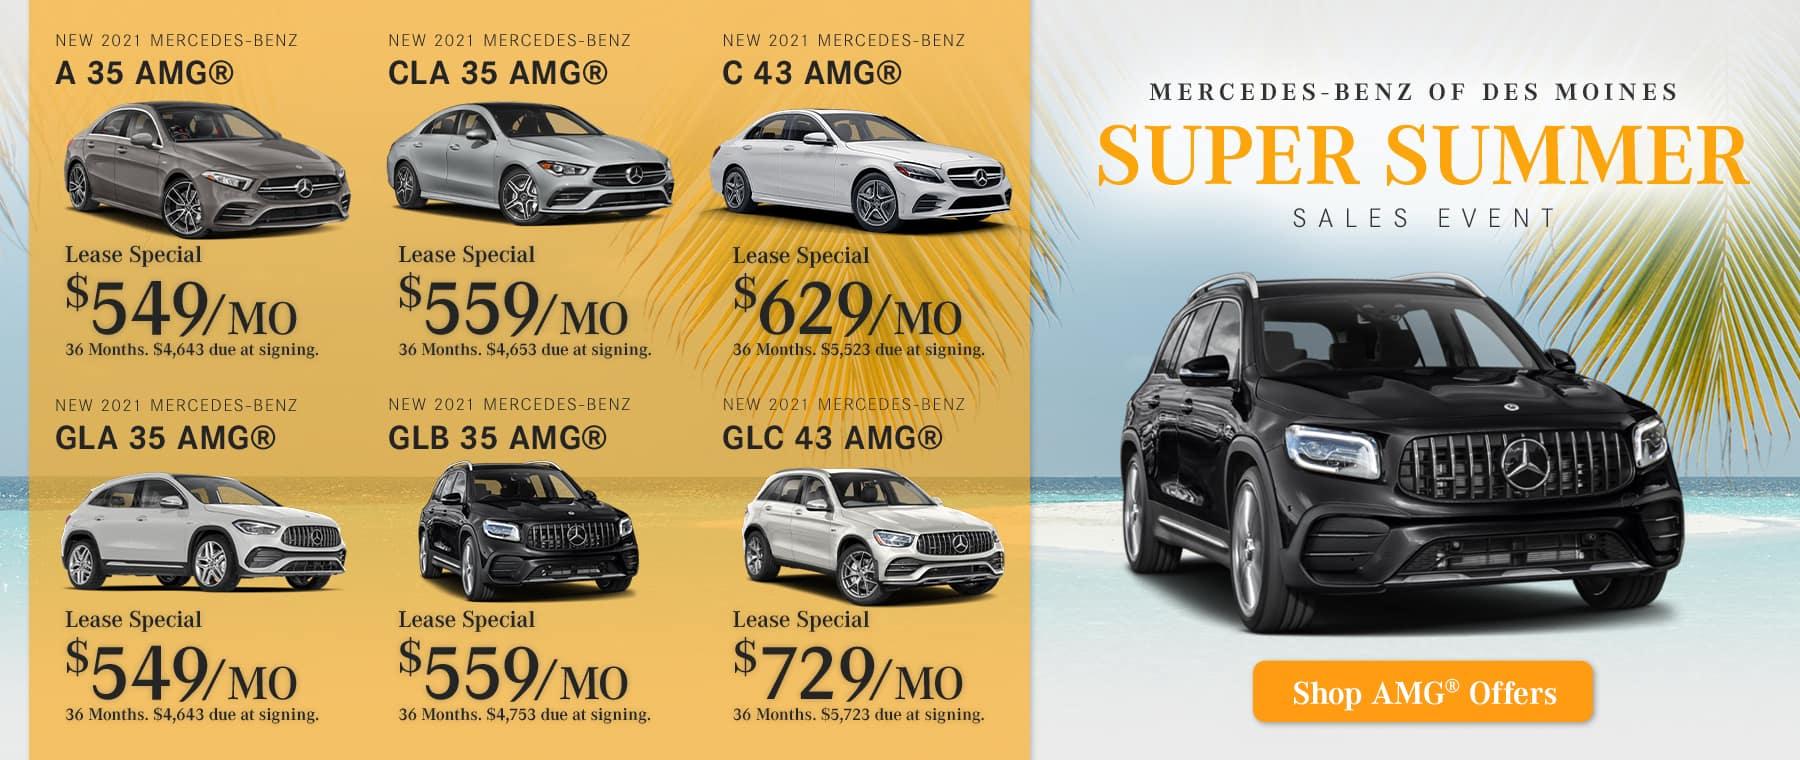 MDIA-213108-Homepage-1800×760-AMG®s